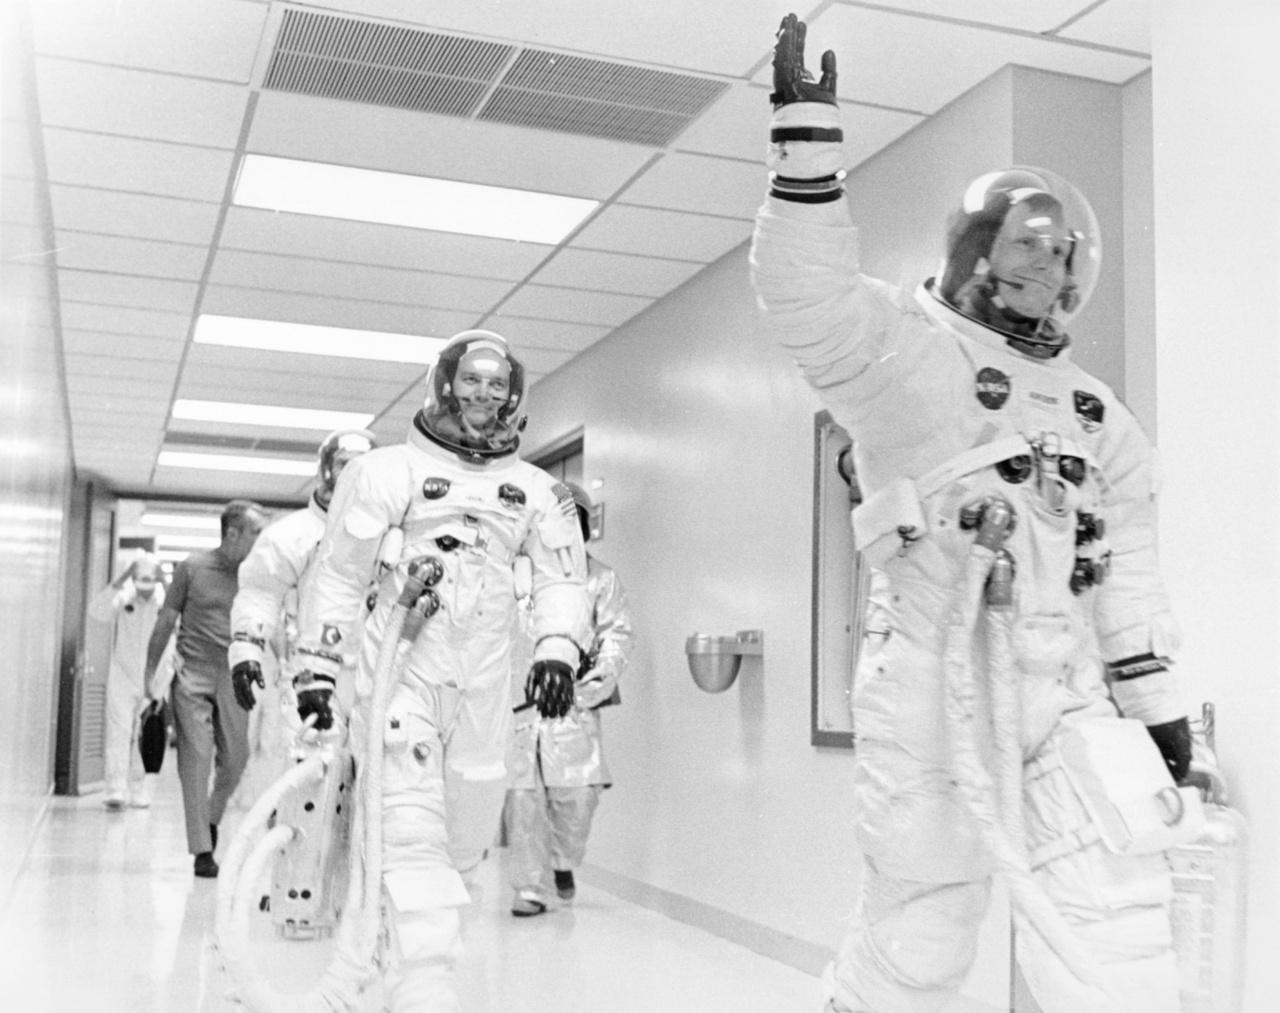 Armstrong, Collins és Aldrin úton az Apollo-11 űrhajó felé – a NASA archív képén.